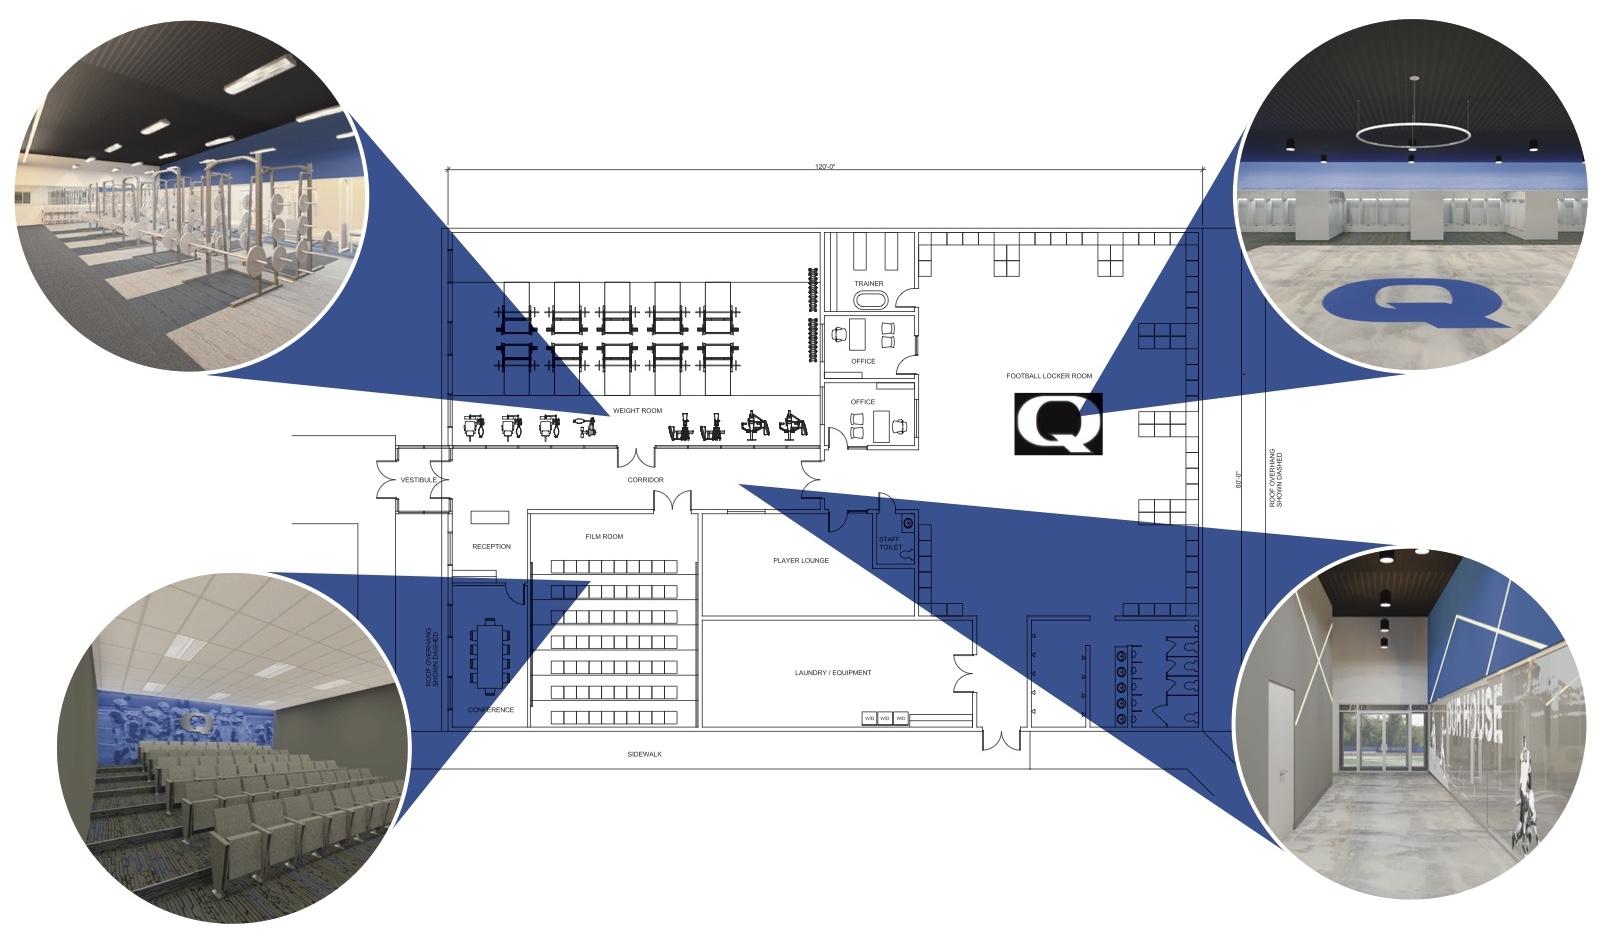 QuincyHighSchool-MKTPiece (003).pdf (00723764xA60F7).jpg